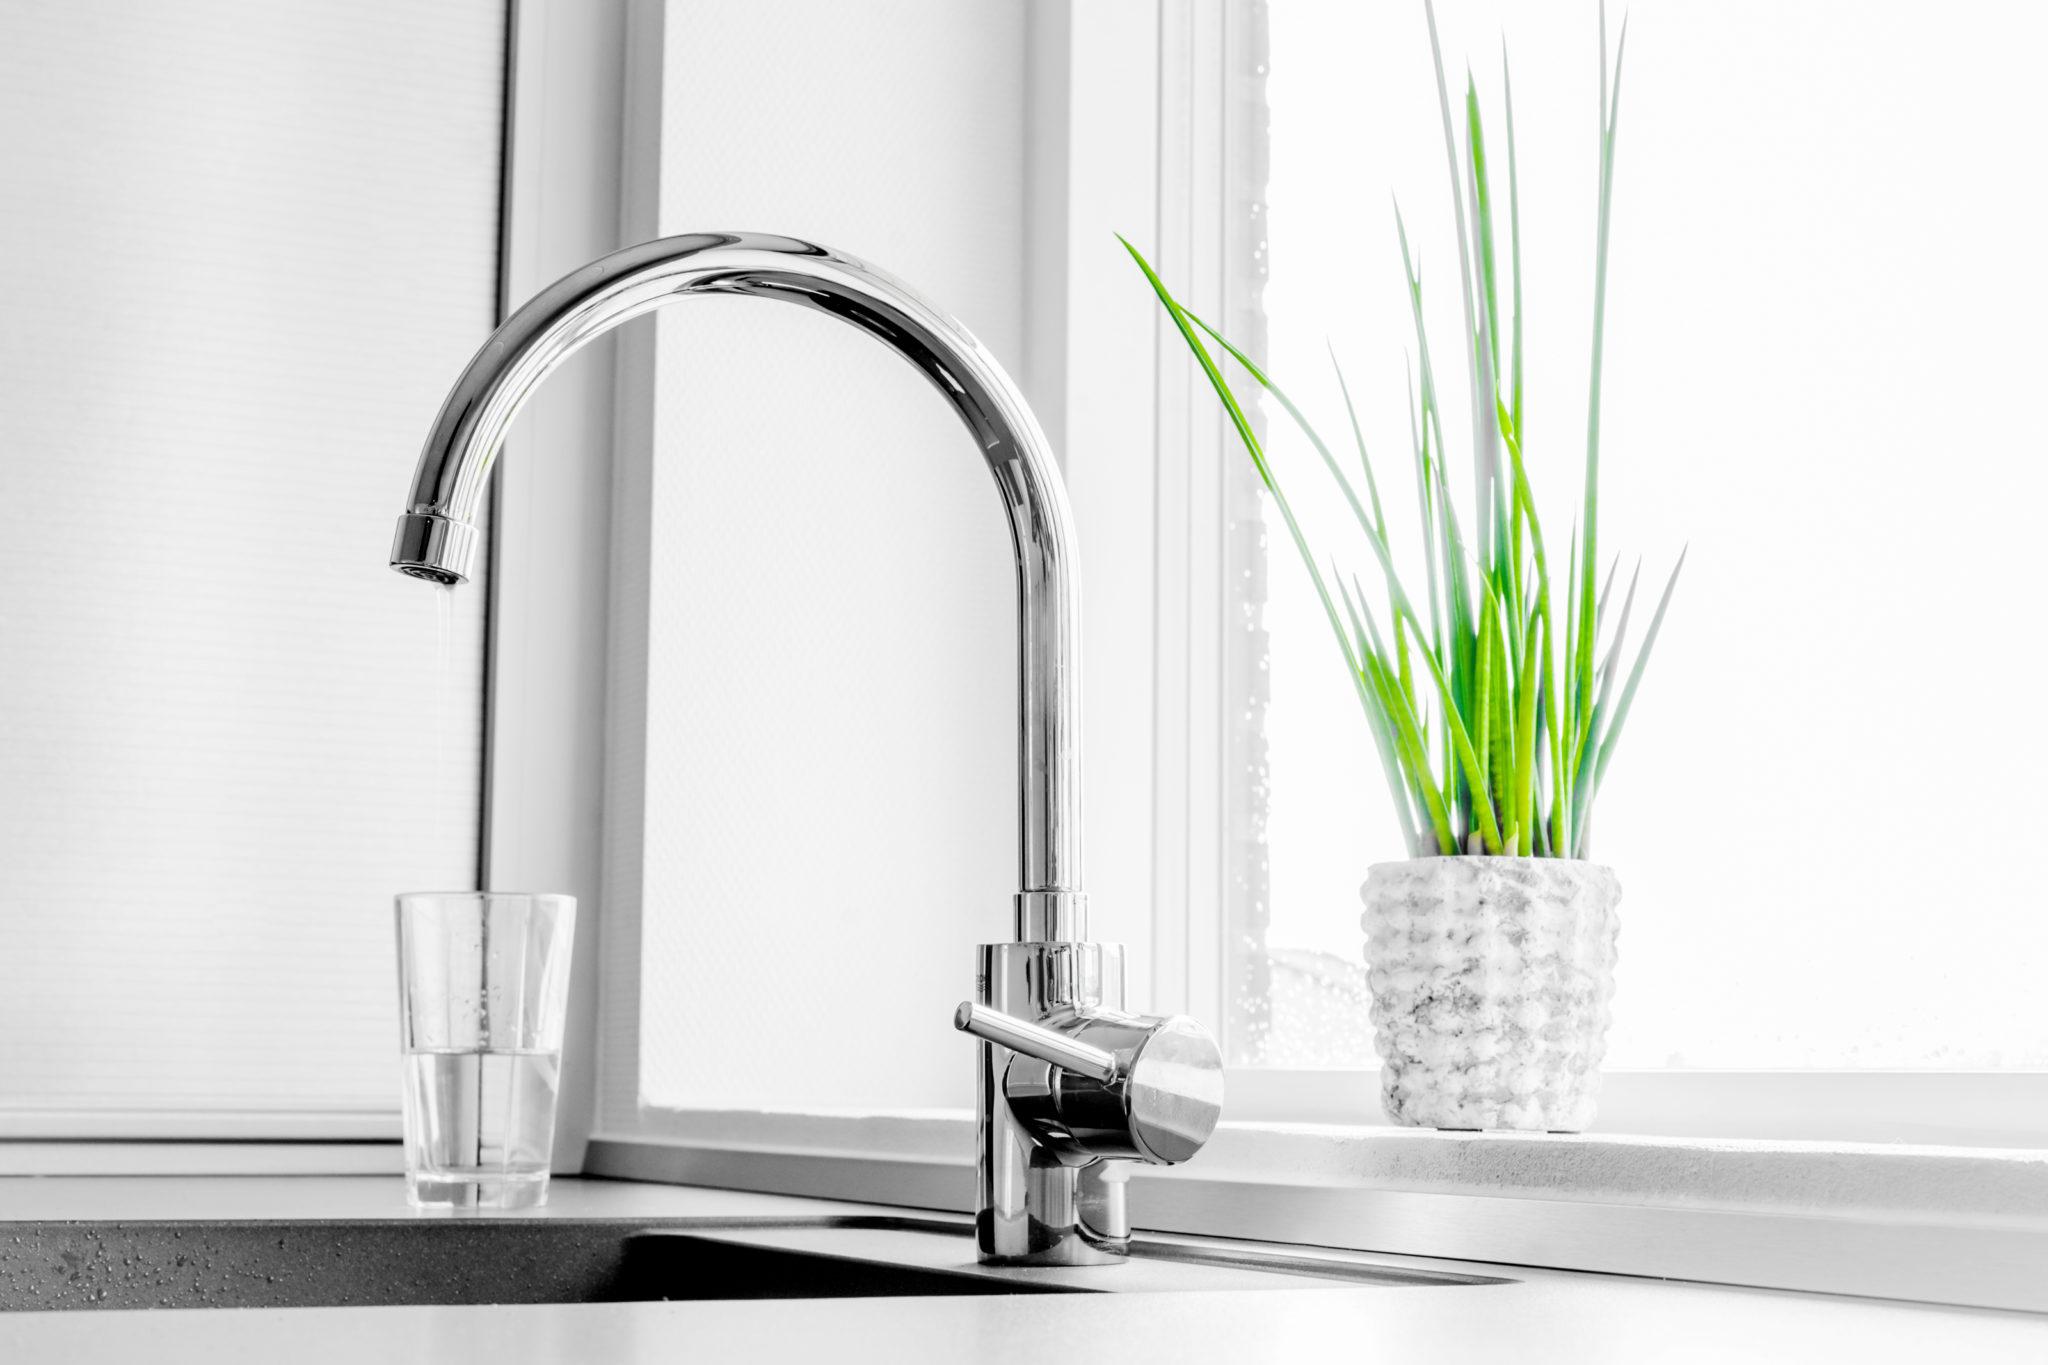 gatti-plumbing-kitchen-sink-faucet-installation-repair